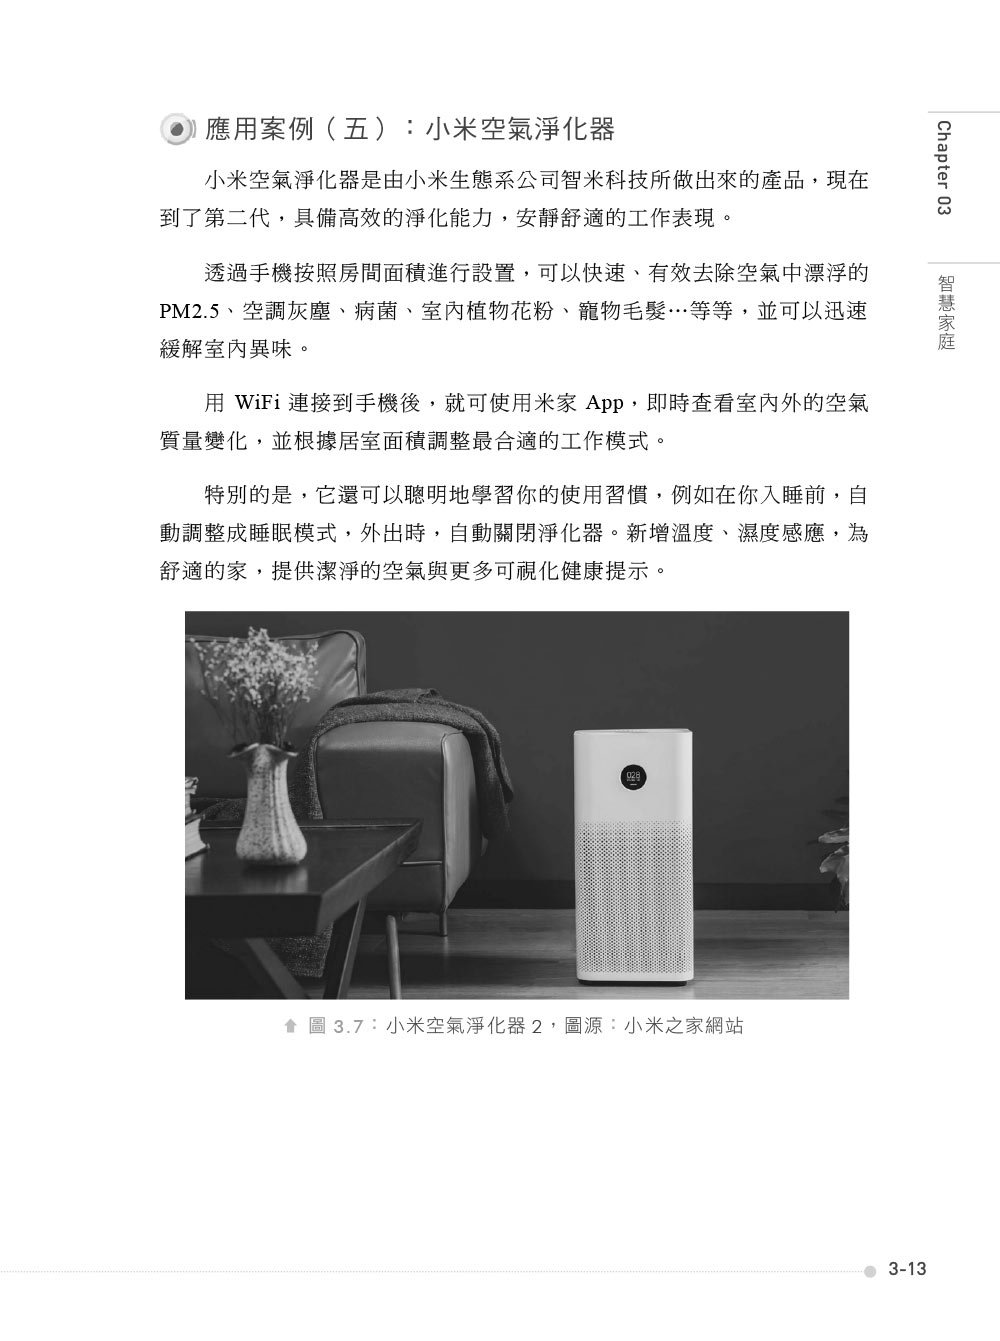 AIoT 人工智慧在物聯網的應用與商機, 2/e-preview-8